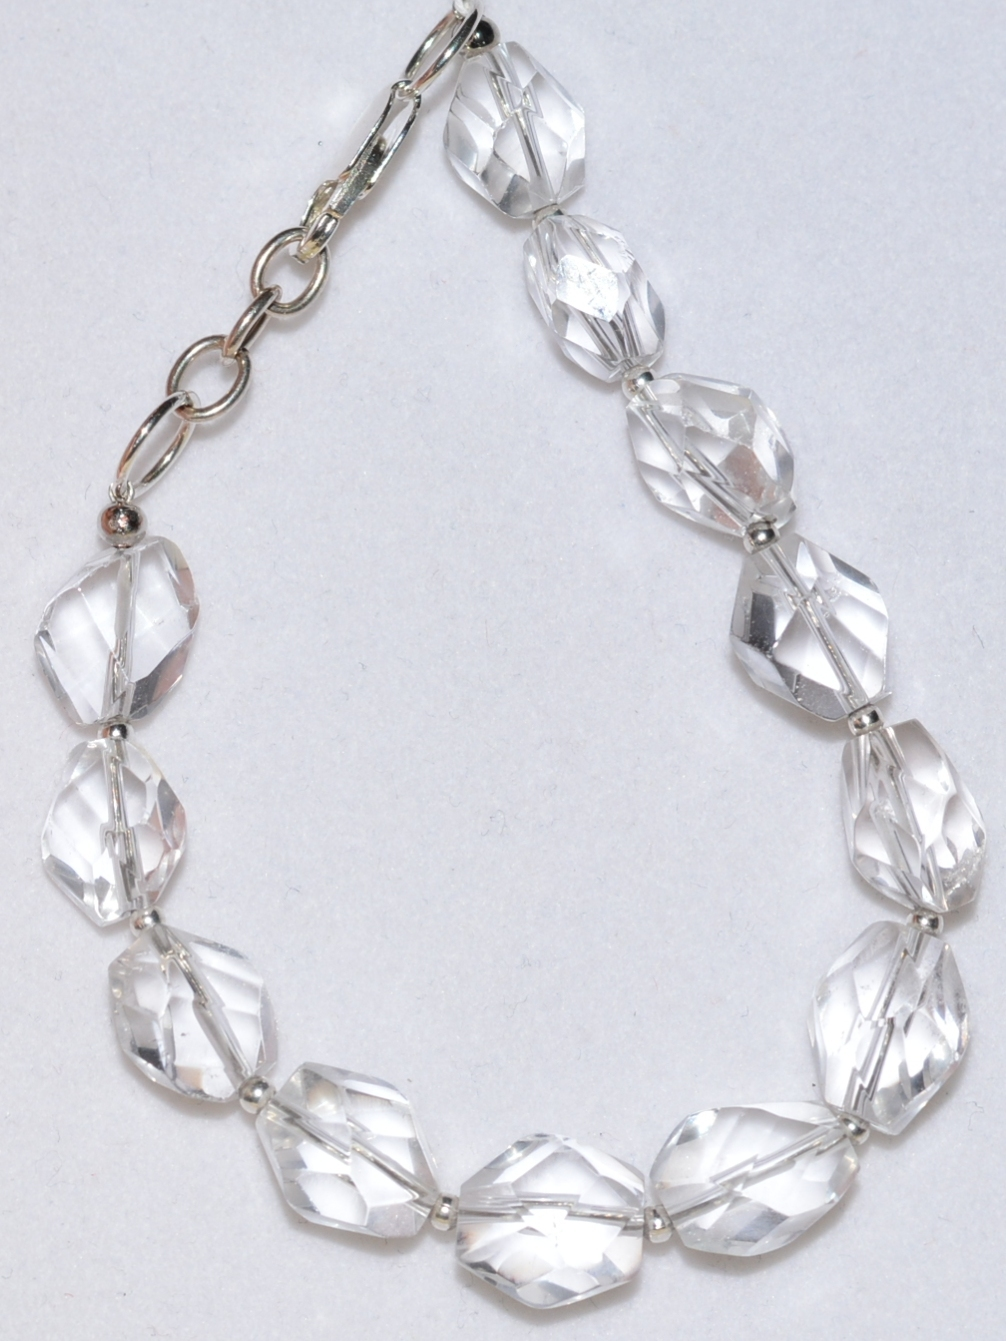 805- хрусталь (браслет из натуральных камней)